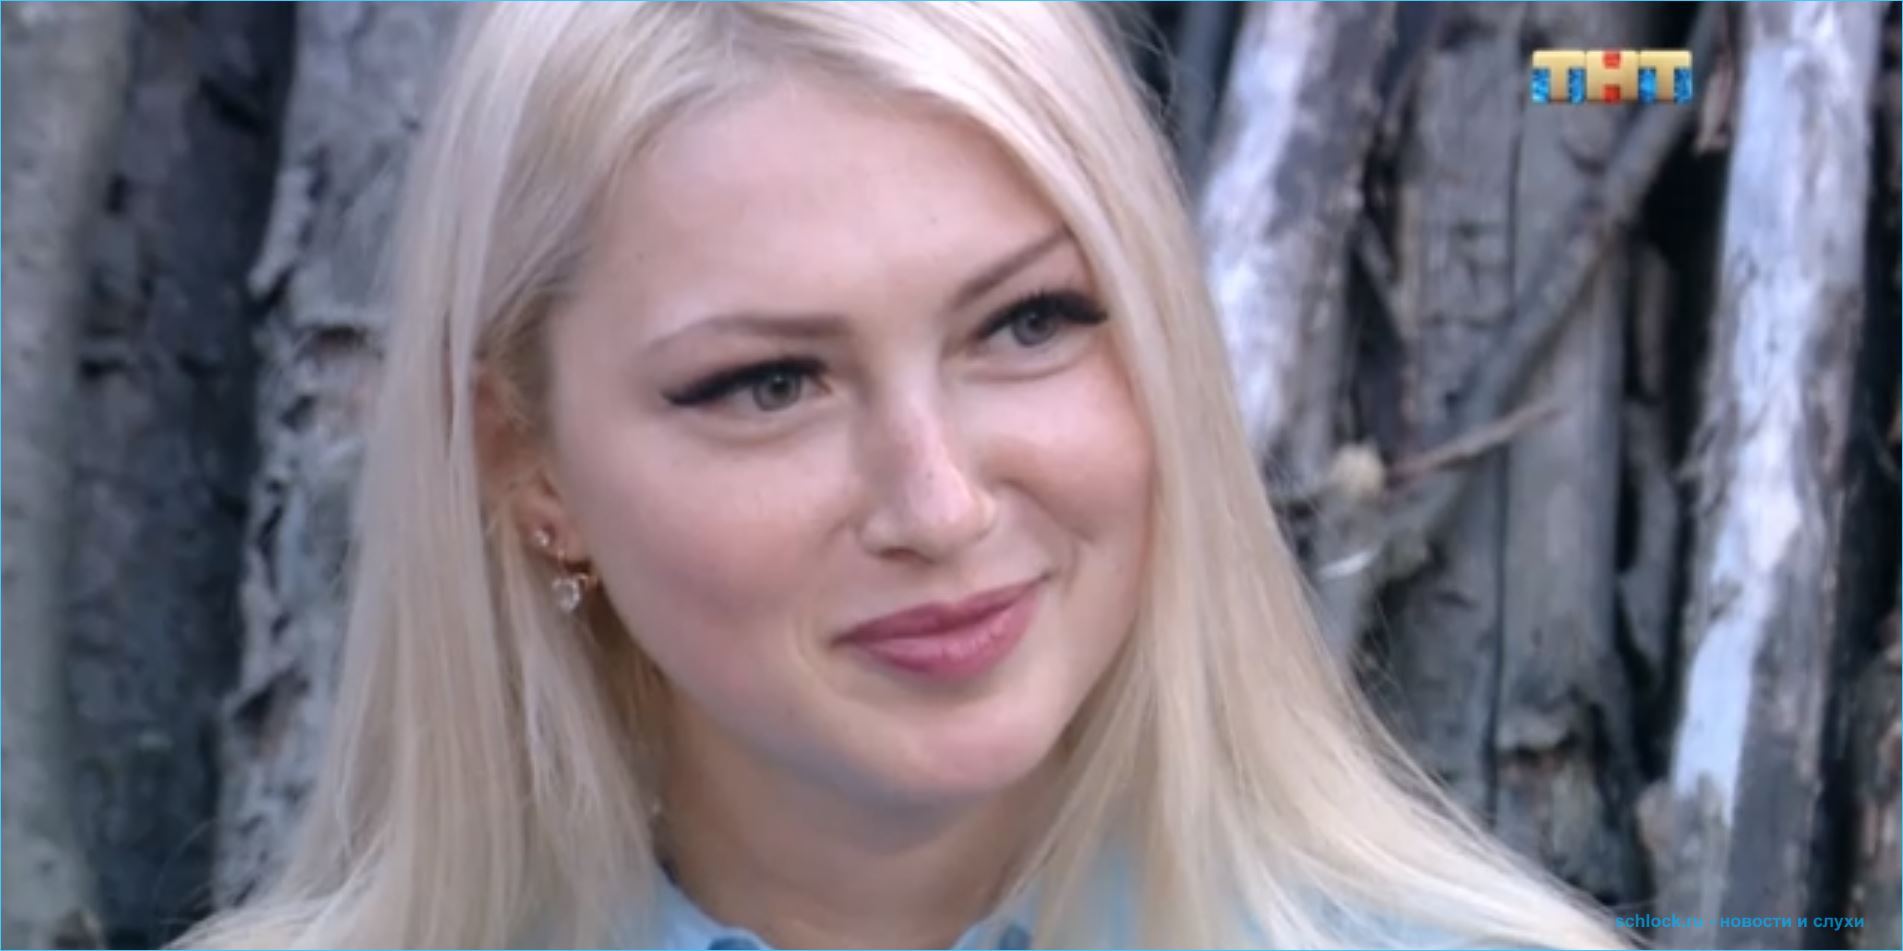 Екатерина Скютте ждет ребенка от Сороки?